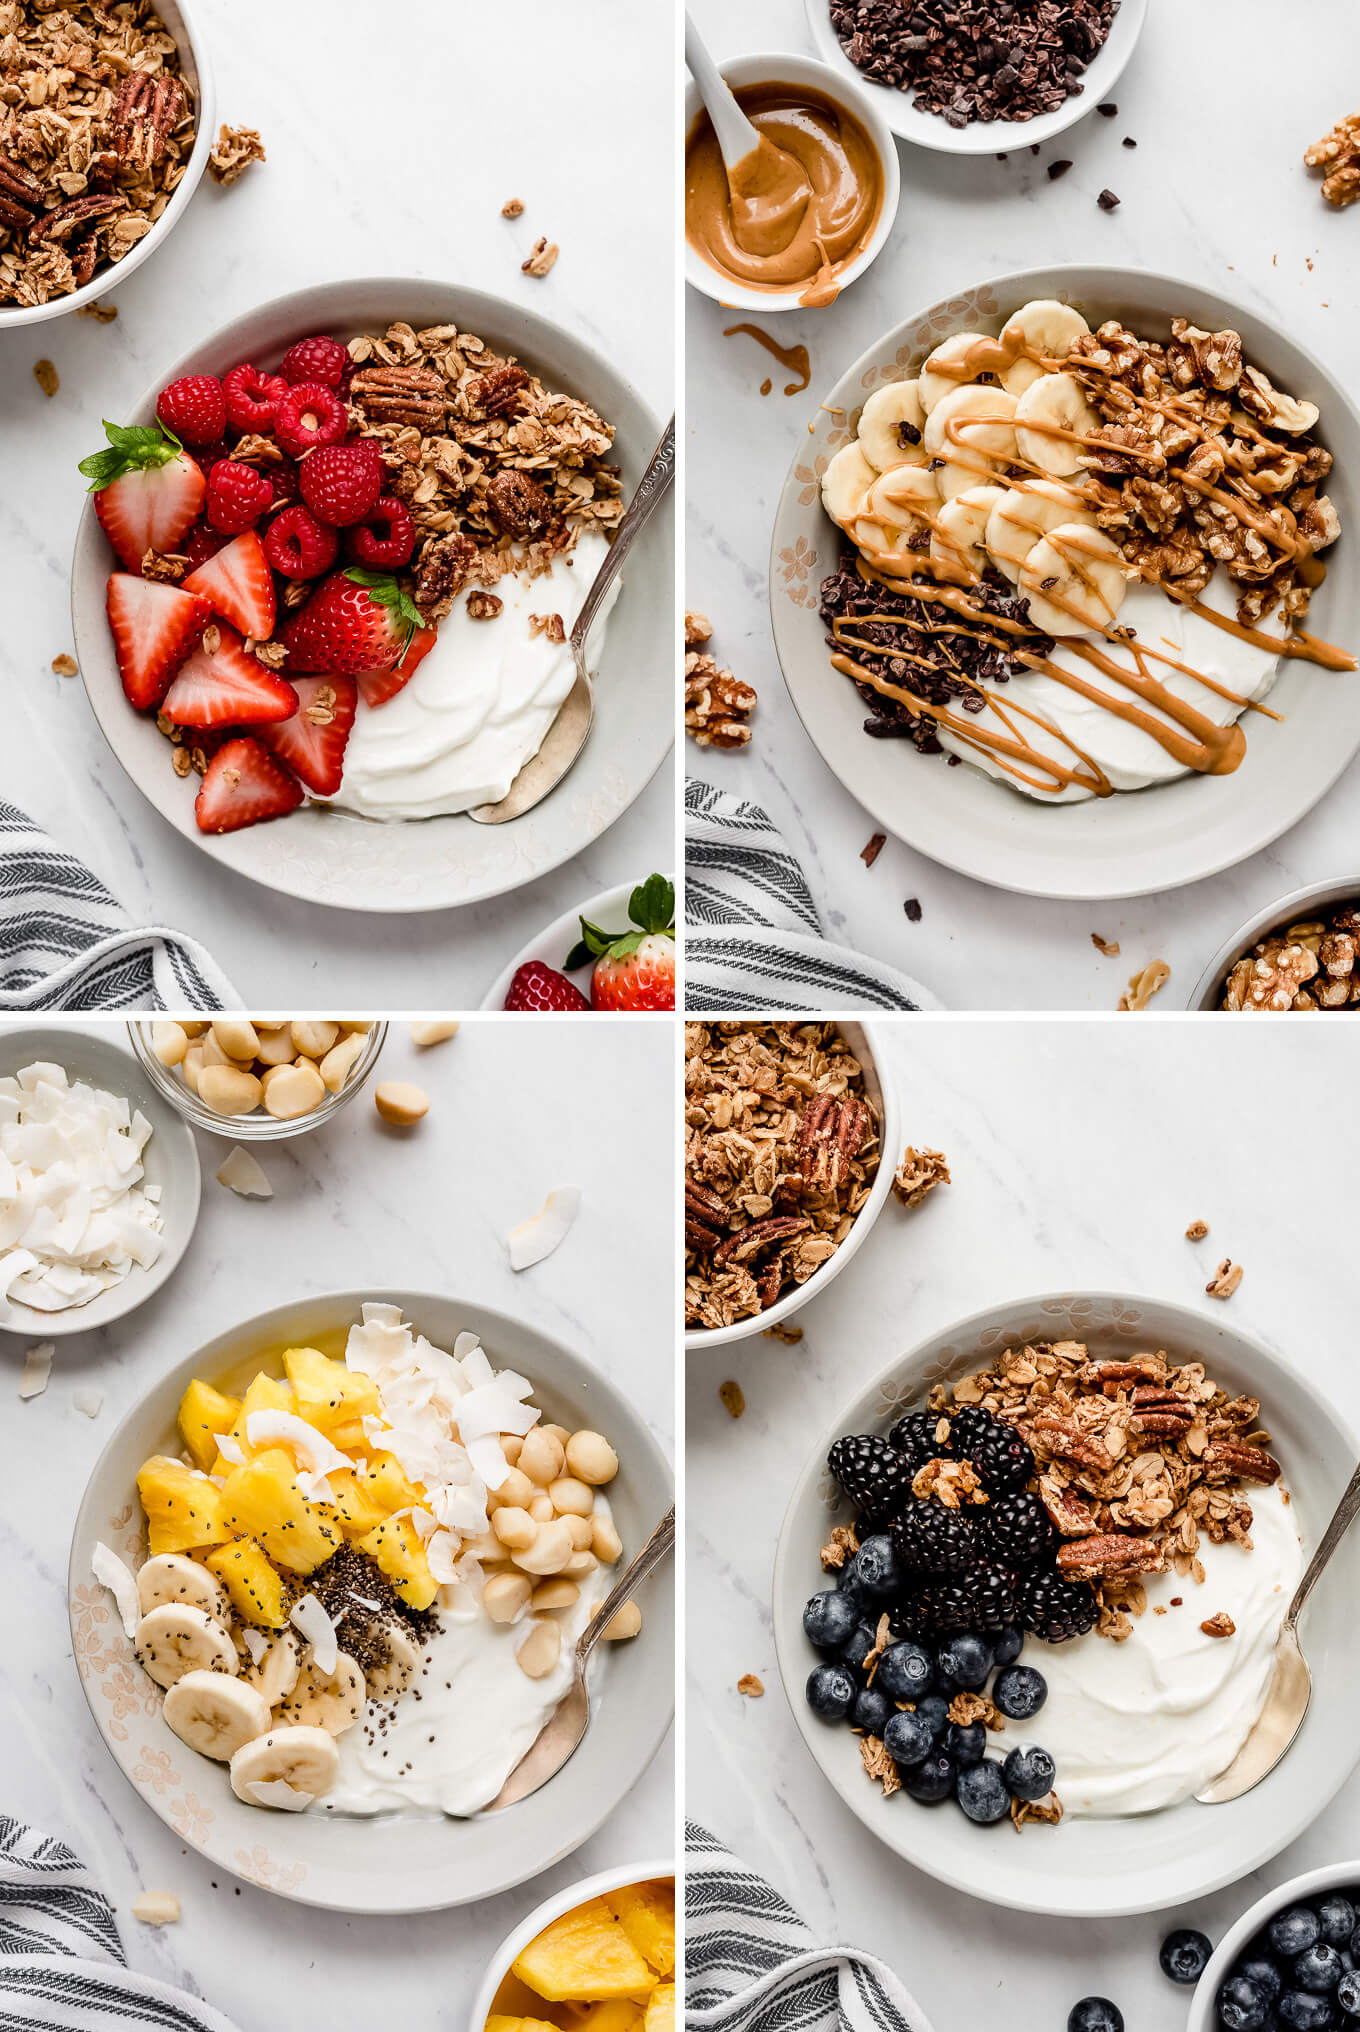 Four photos of yogurt bowls: Red Berry Yogurt Bowl, Chunky Monkey Yogurt Bowl, Tropical Yogurt Bowl, Black and Blue Yogurt Bowl.